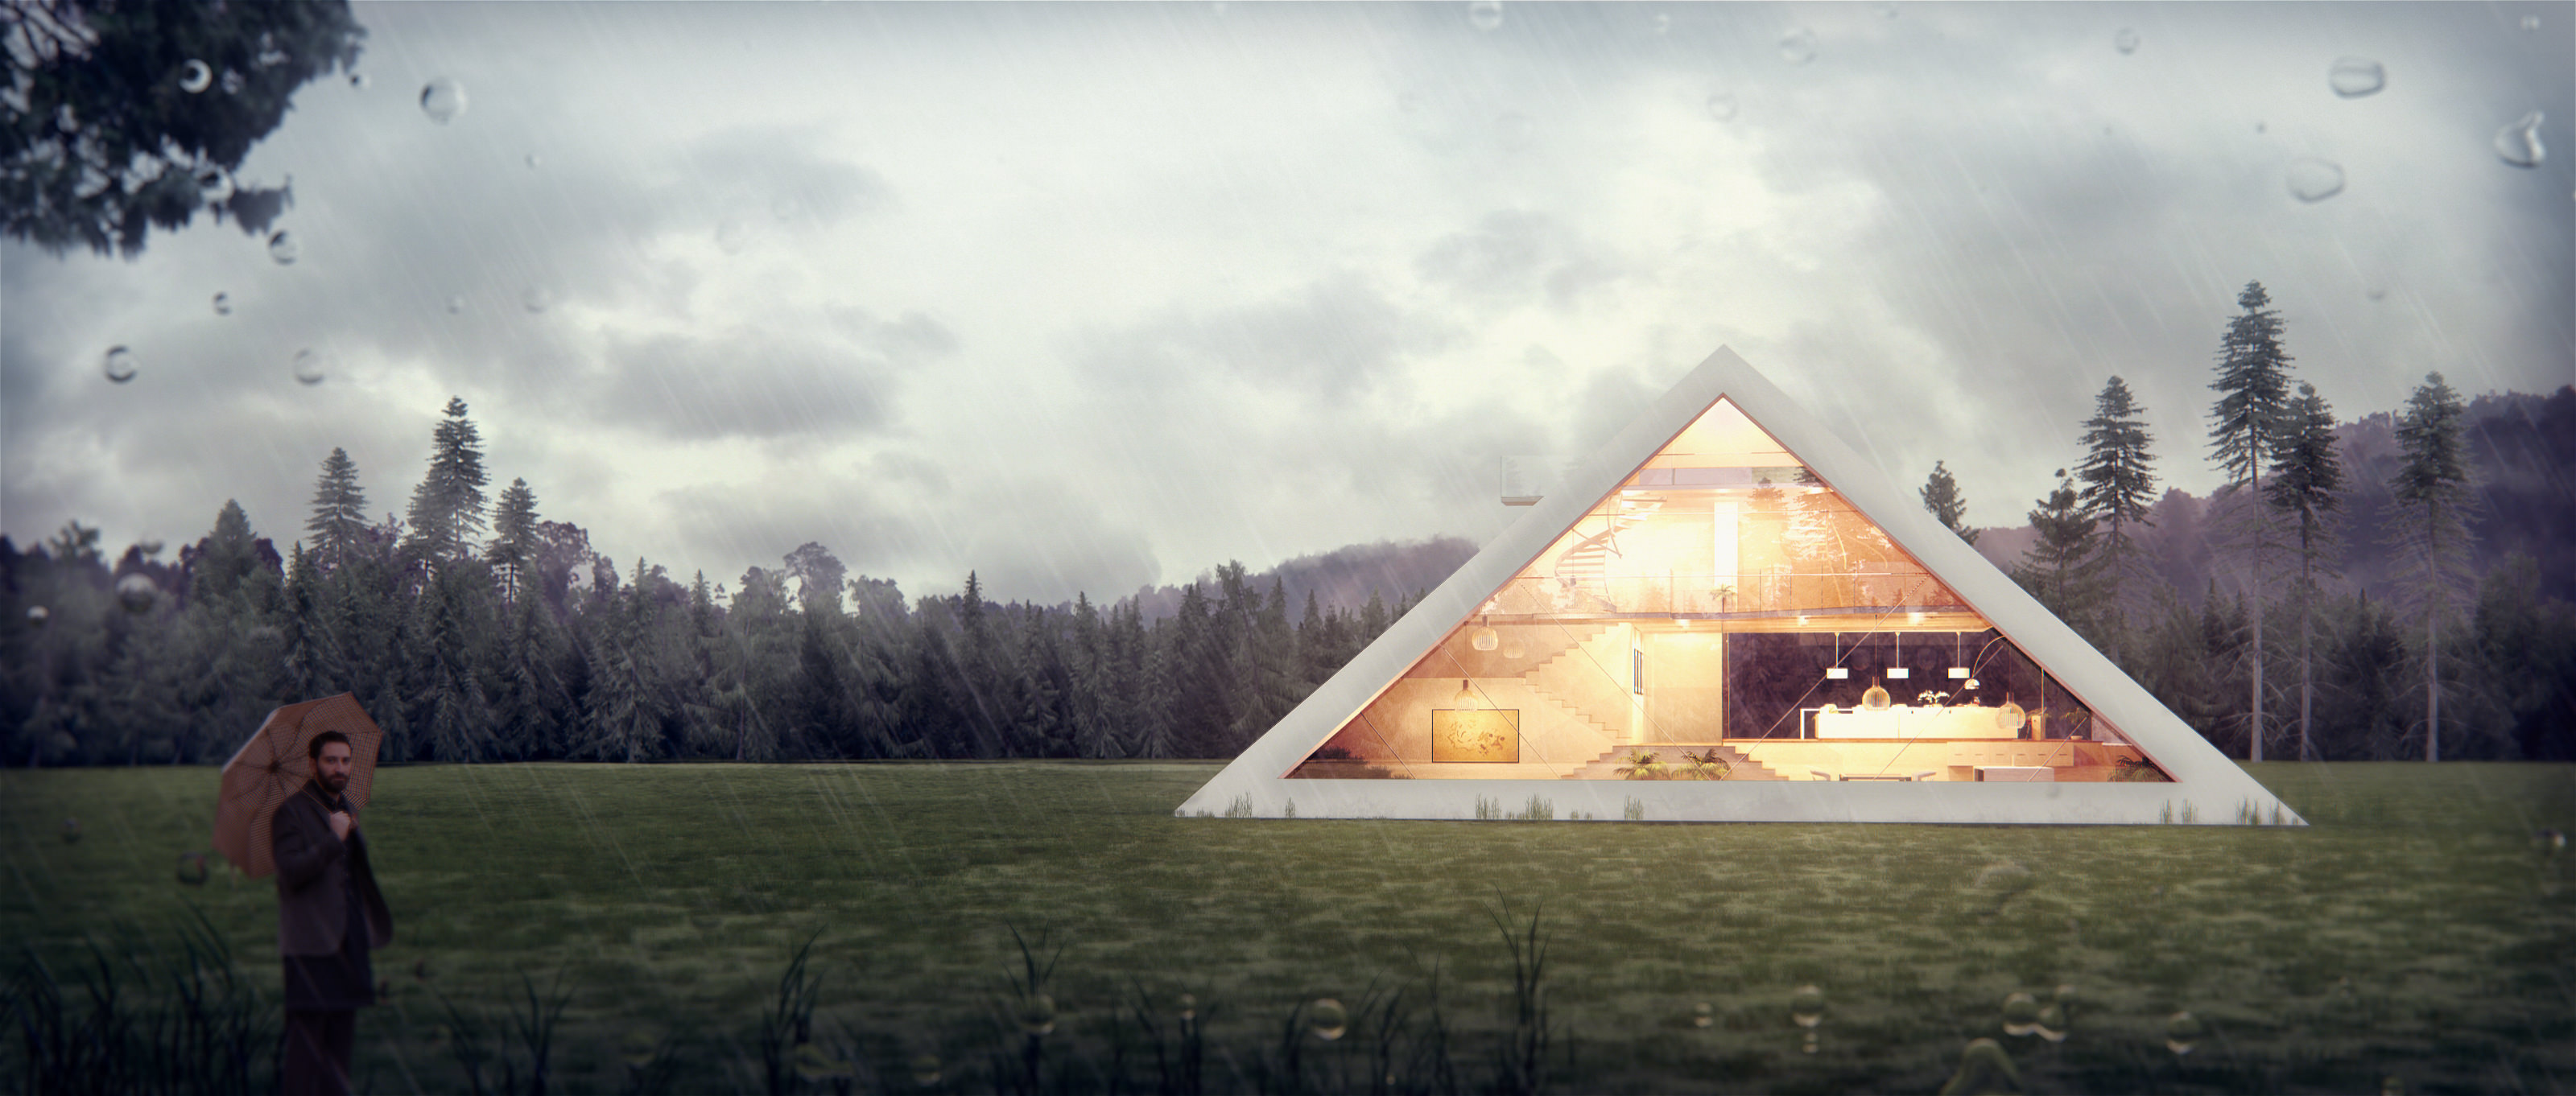 Pyramid House An Architectral Visualization By Juan Carlos